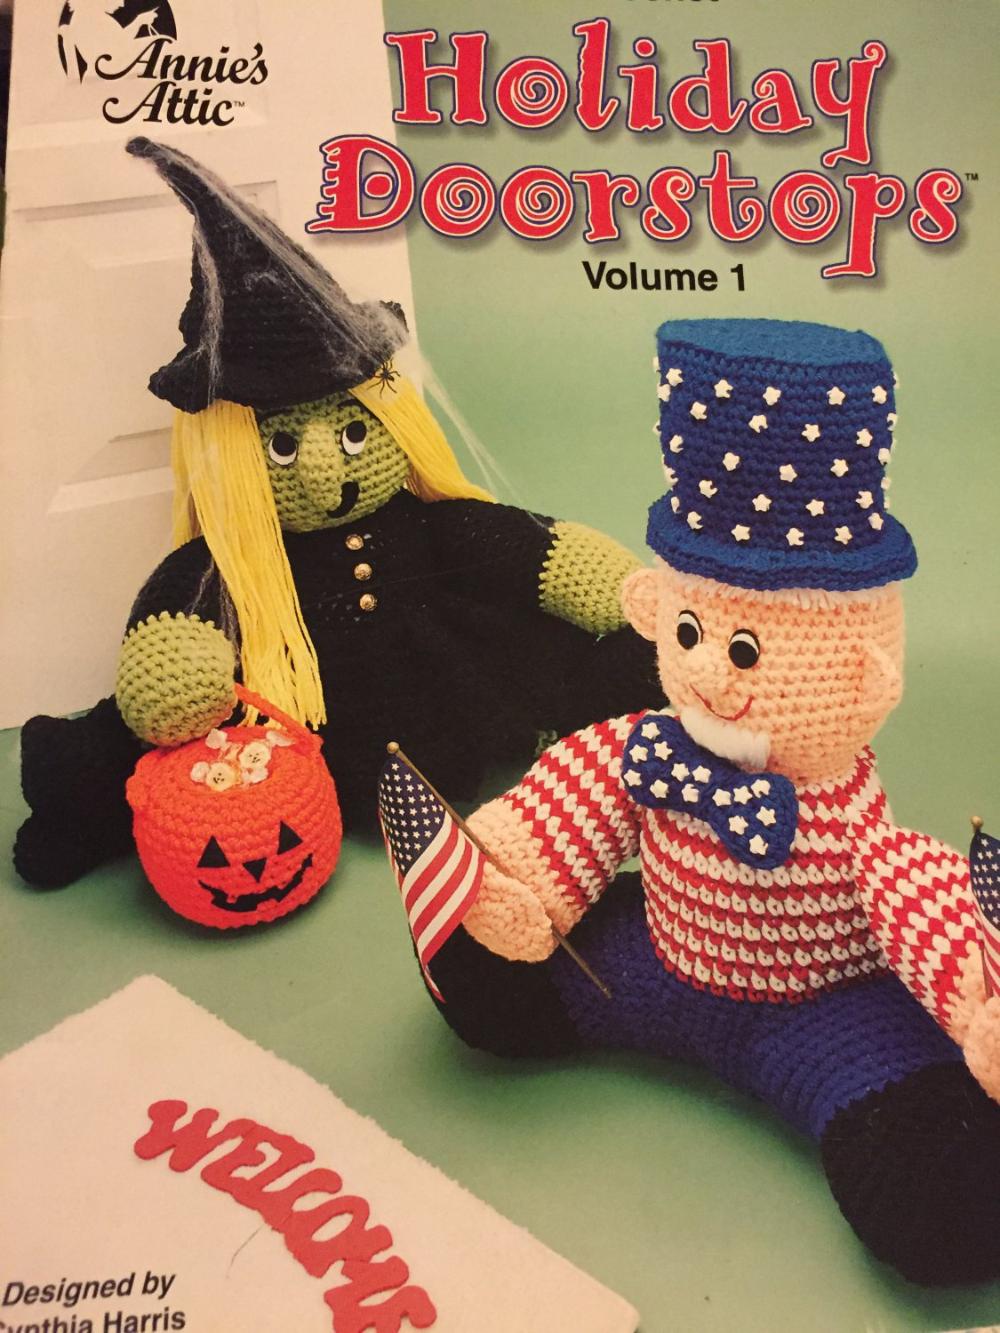 Annie´s Attic Crochet Holiday Doorstops Volume 1 Pattern